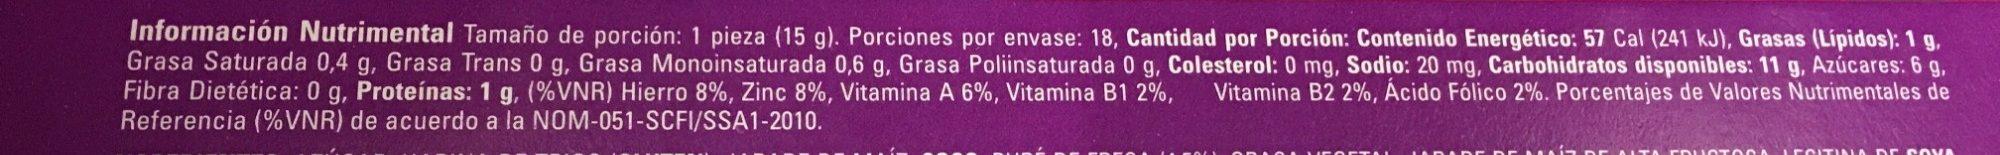 Sponch - Informations nutritionnelles